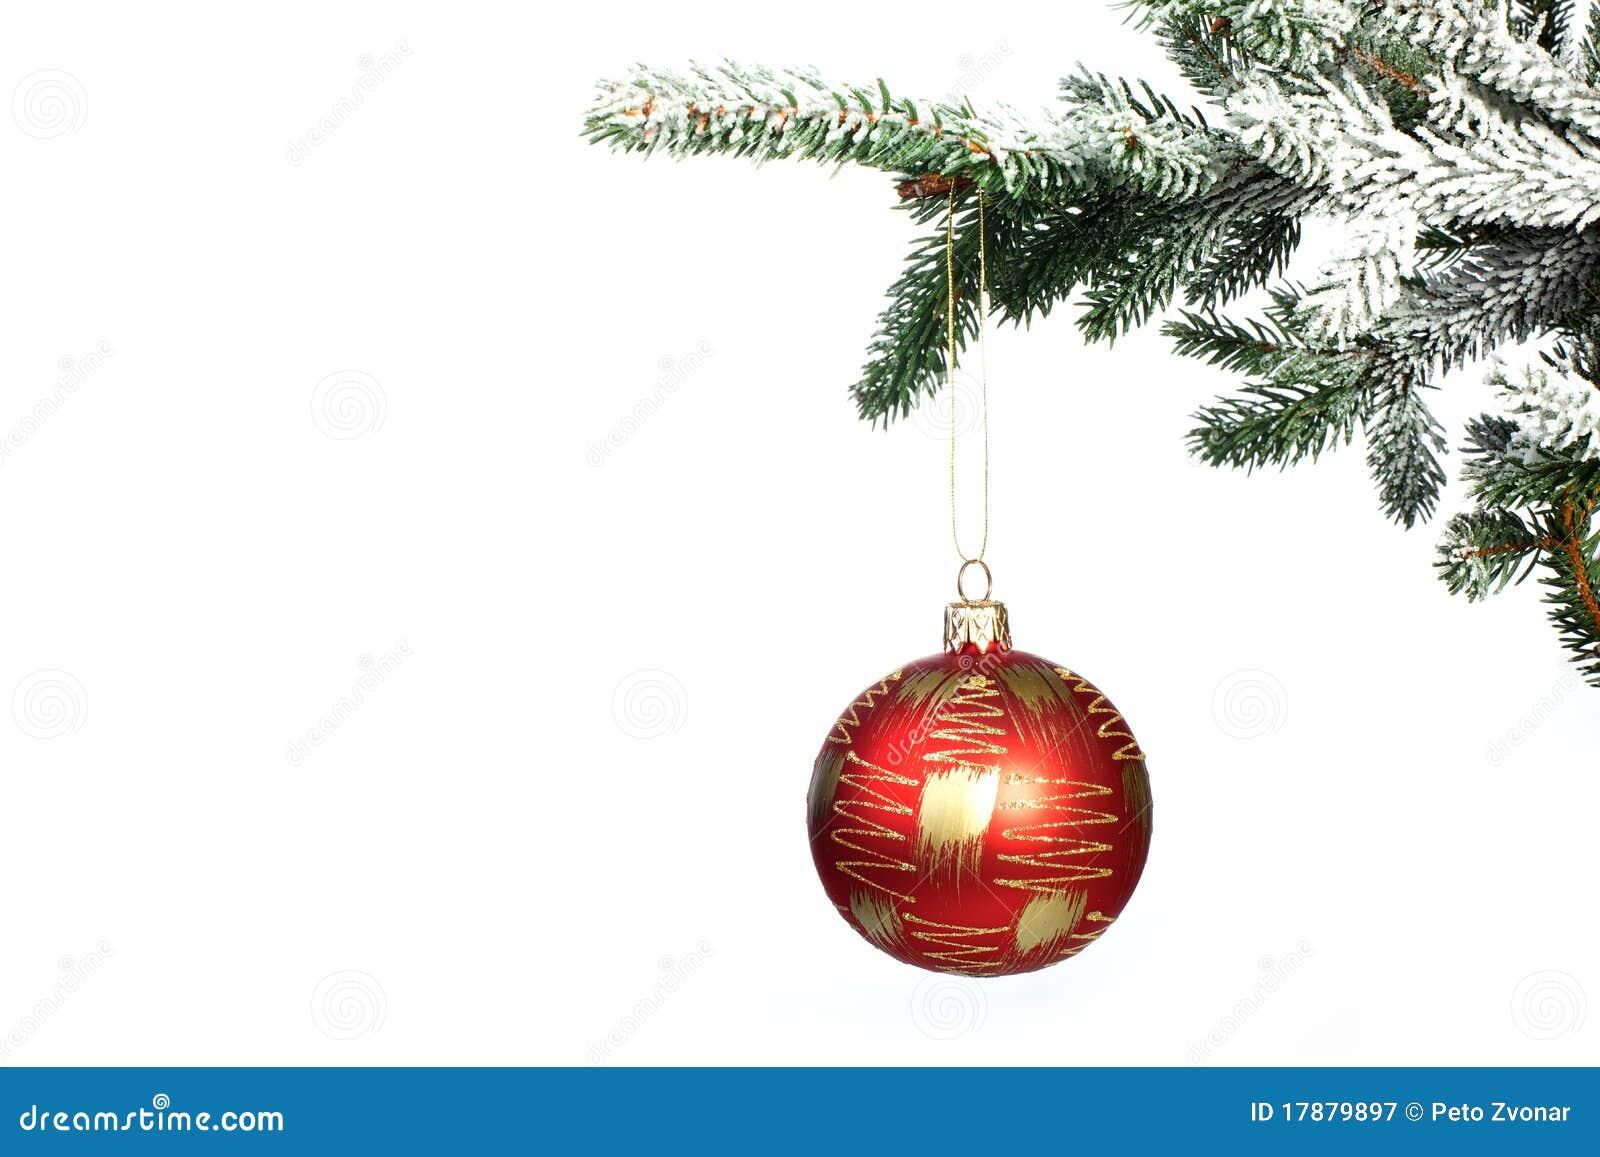 Christmas Tree Ball Placement : Christmas ball on tree royalty free stock